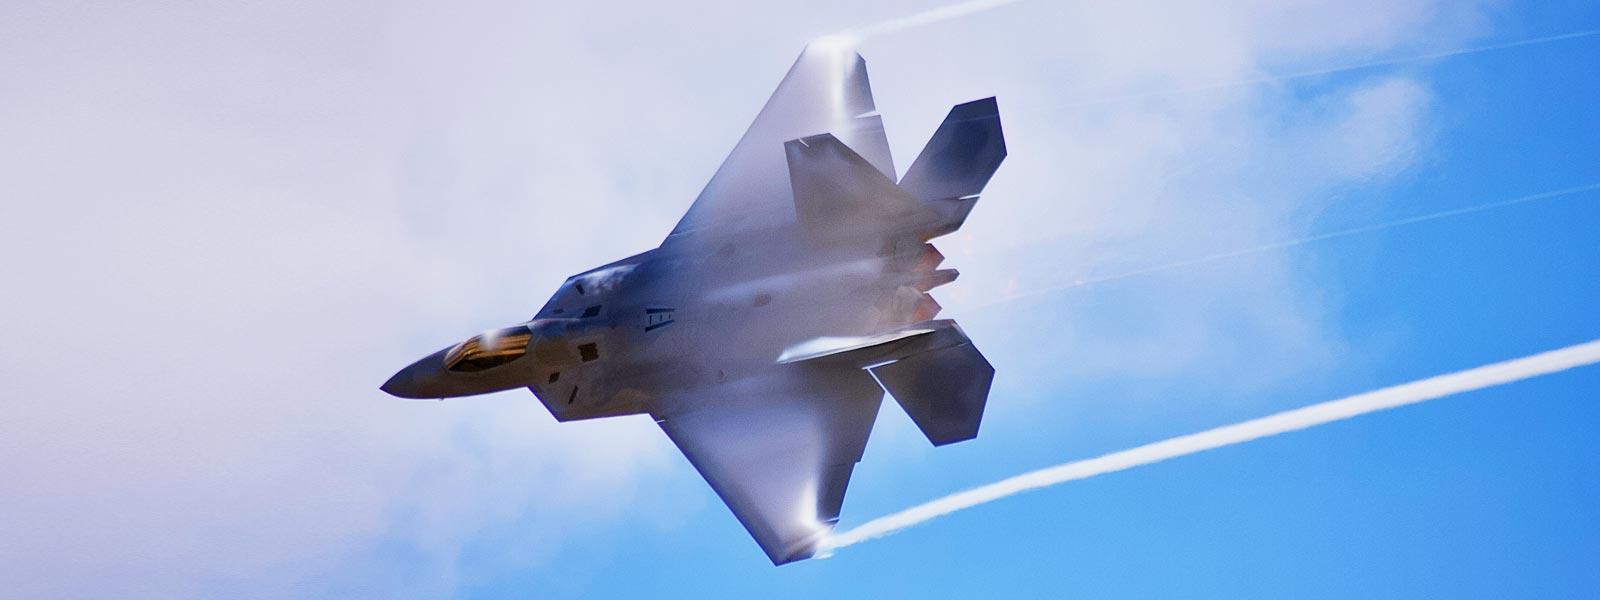 Fastest Fighter Jet